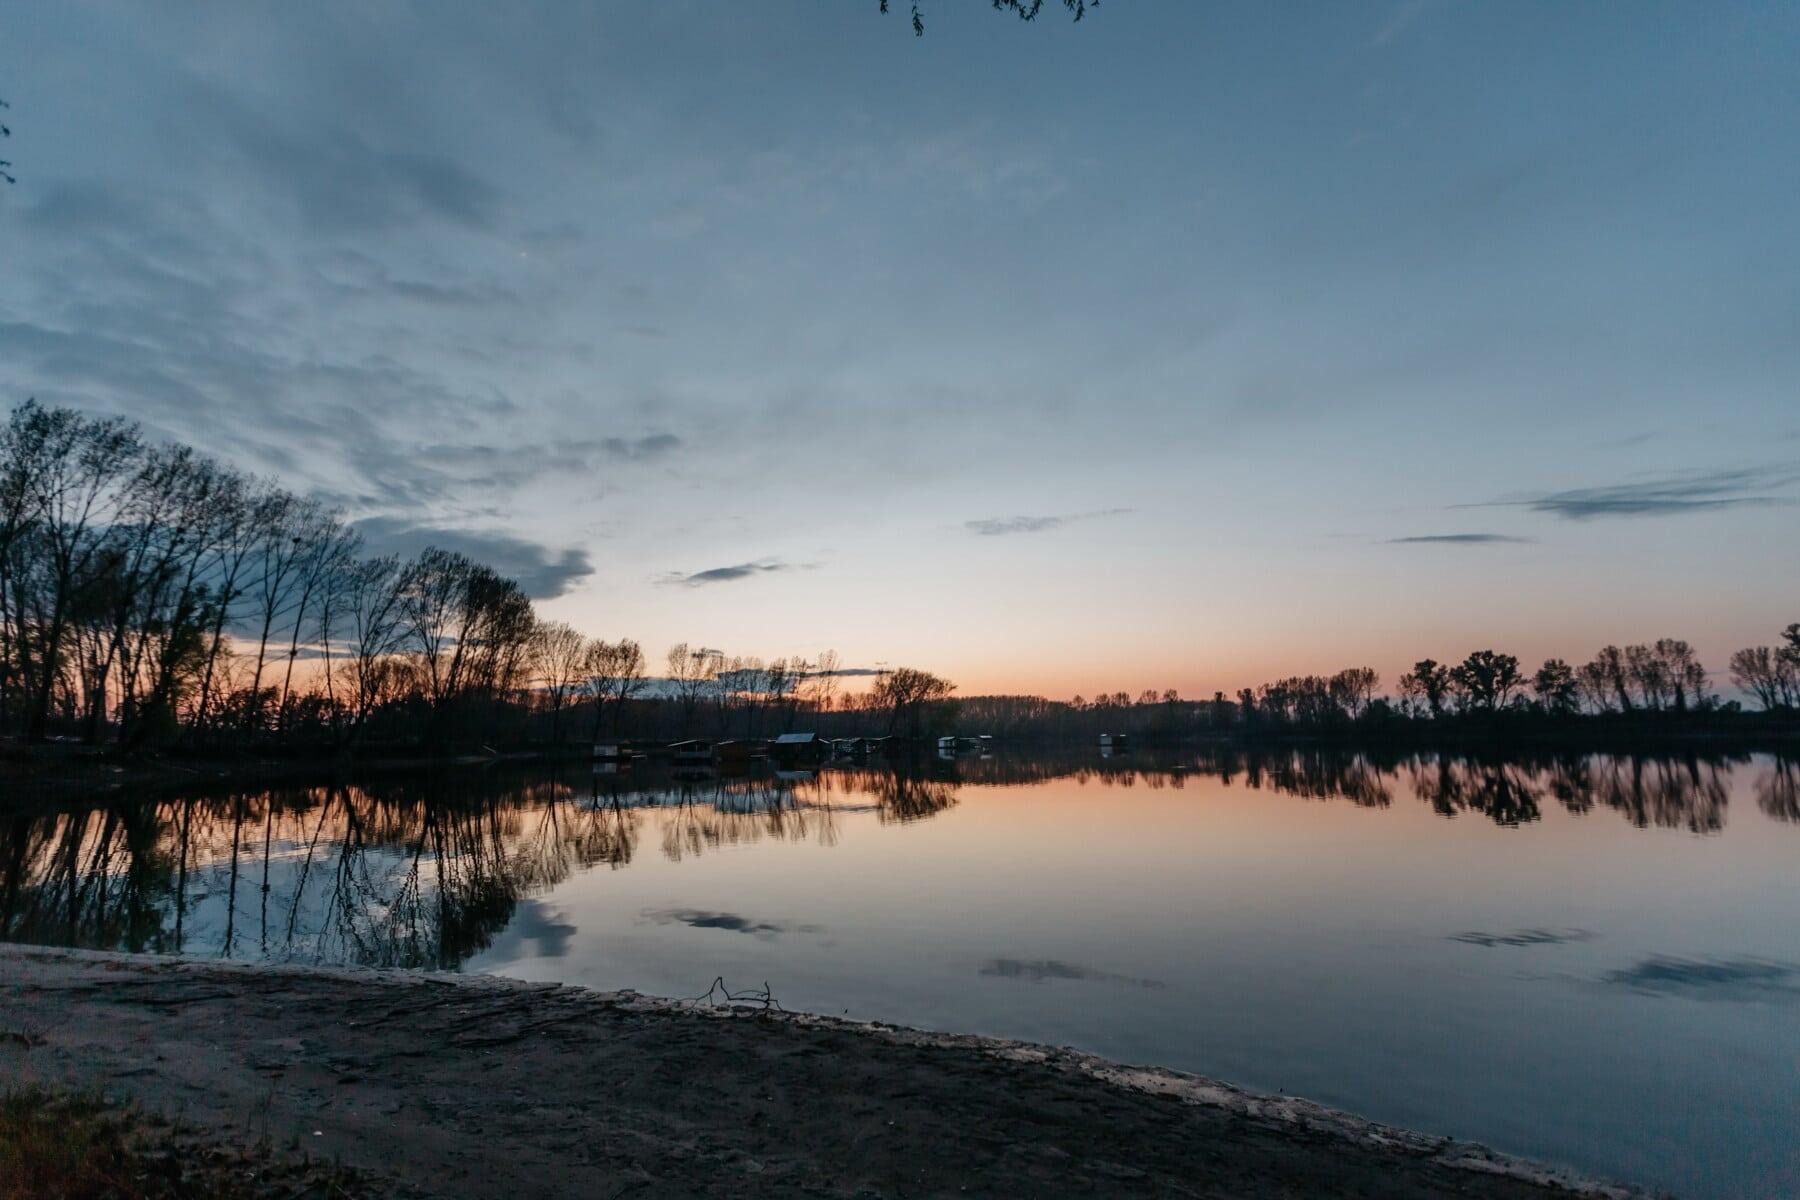 sunrise, lake, beach, sunrays, blue sky, basin, landscape, lakeside, shore, water